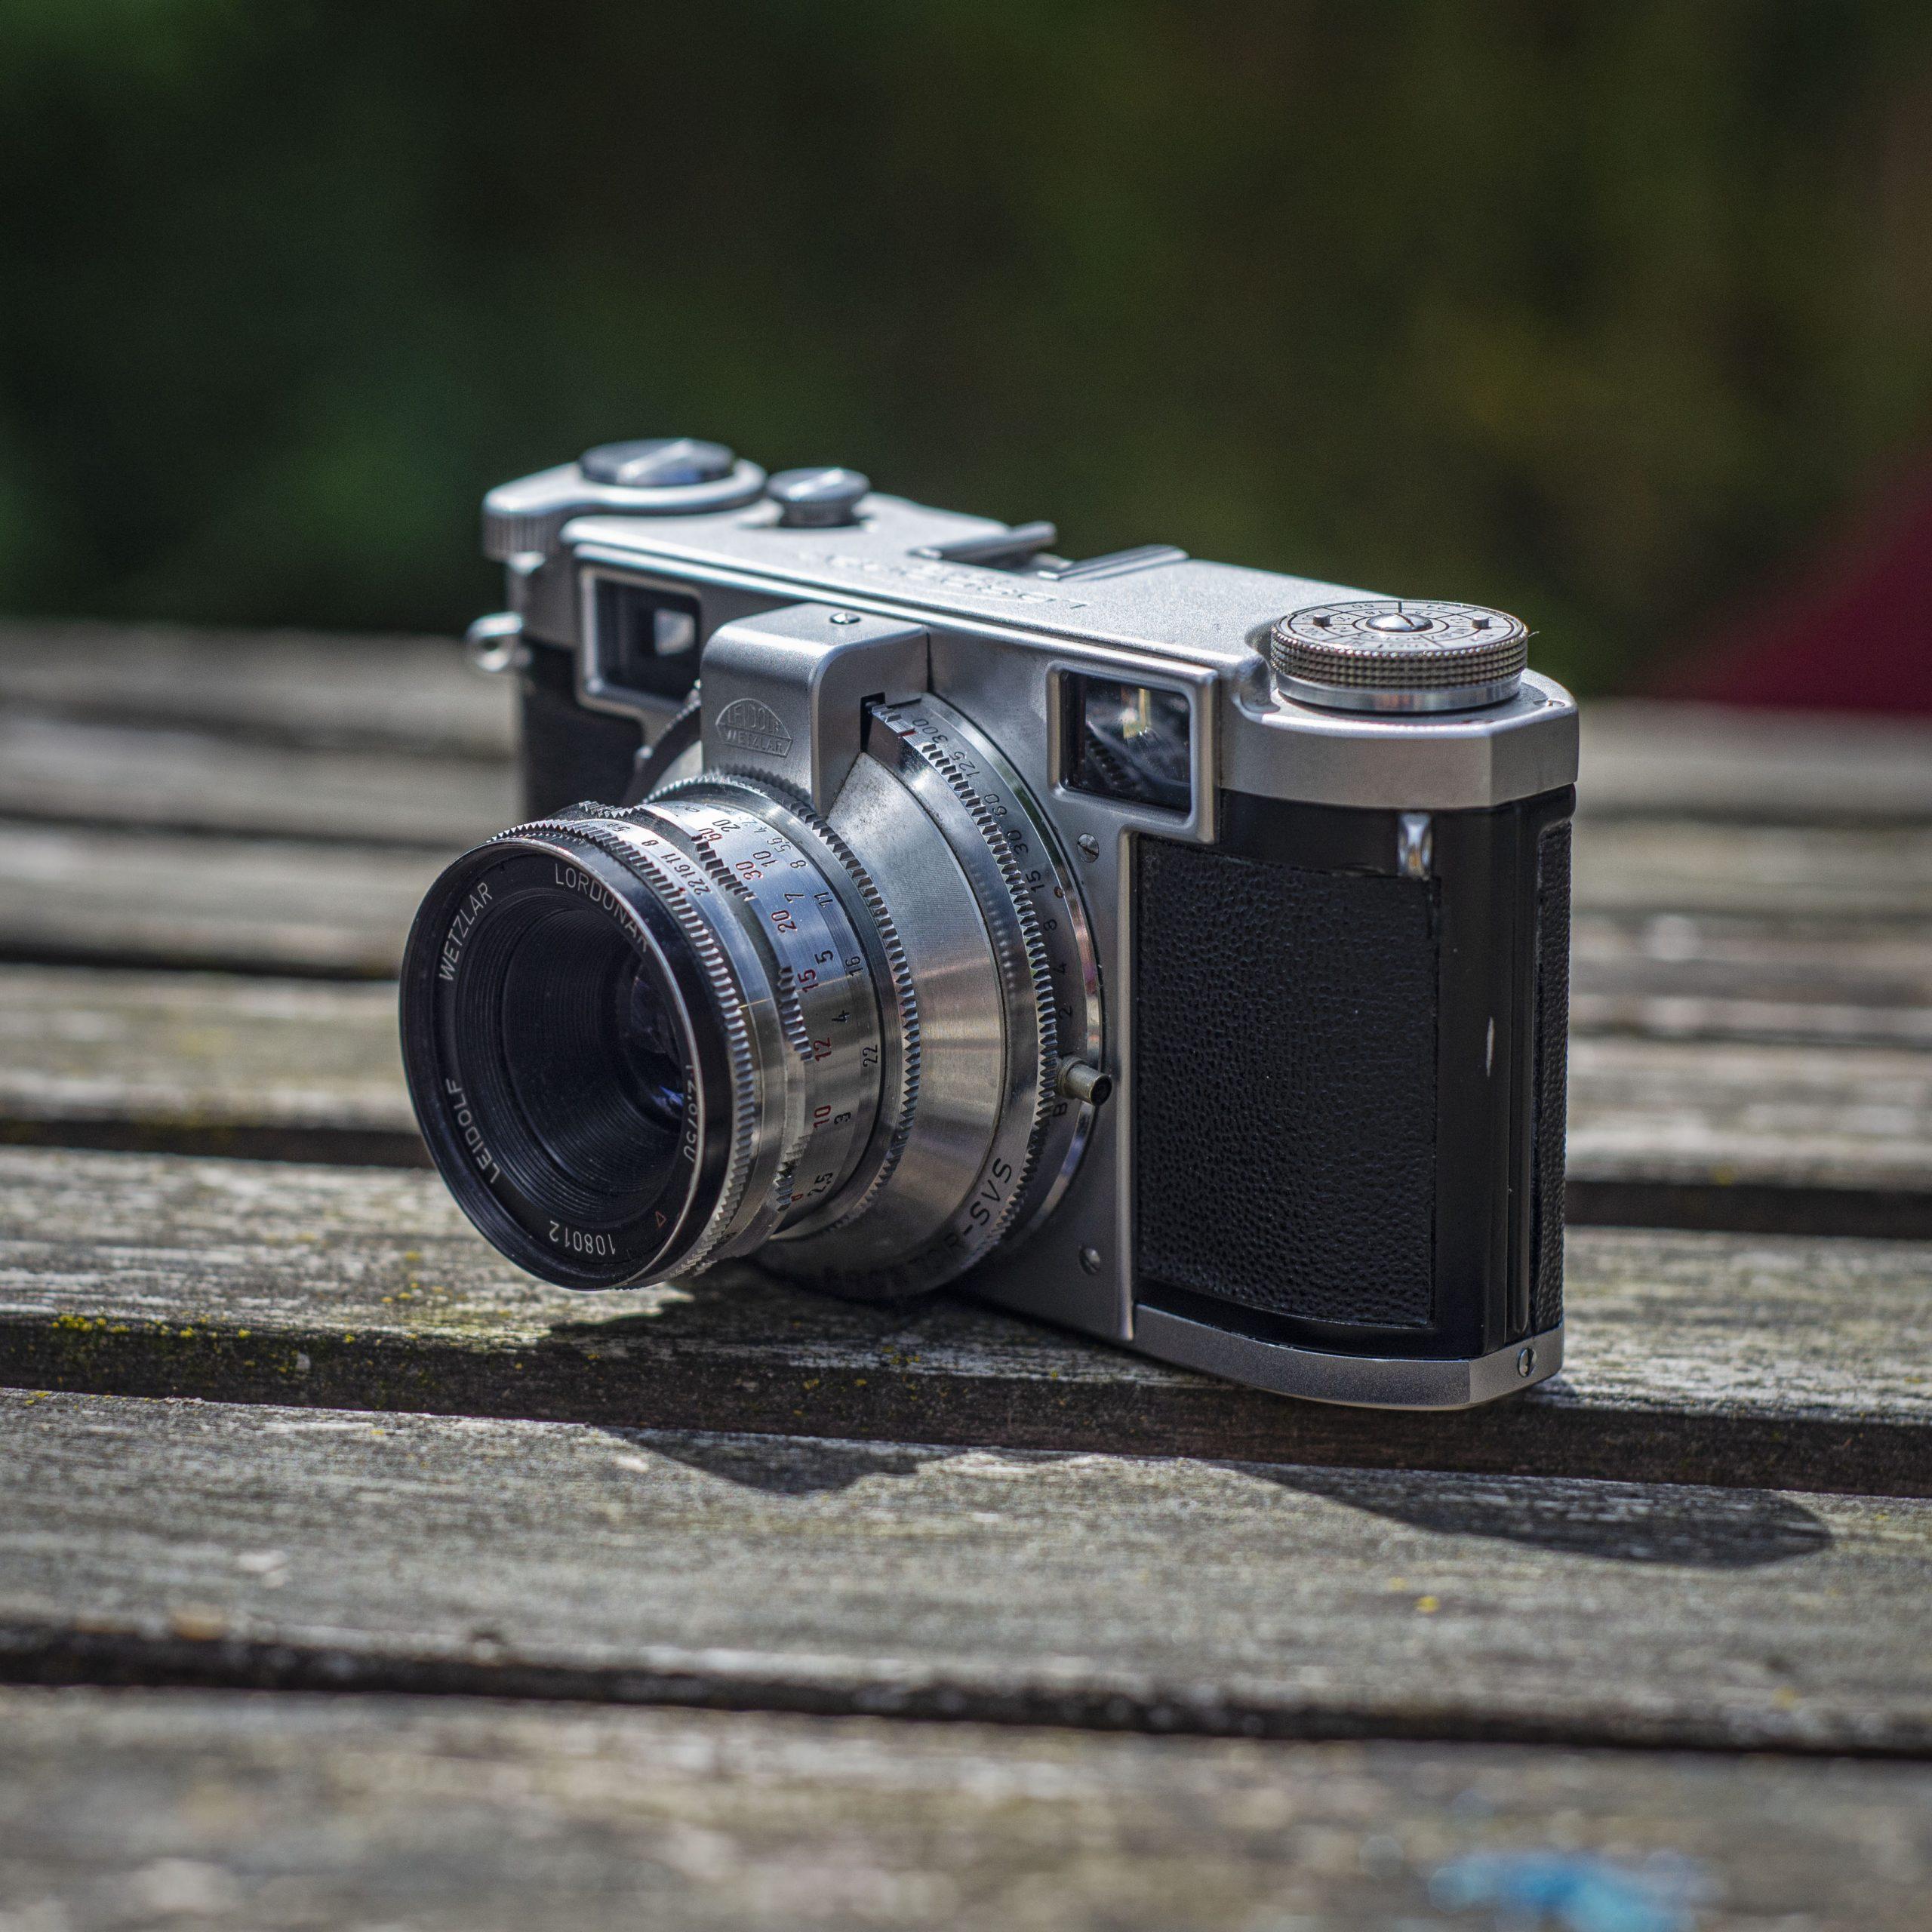 Lordomat 35rmm camera